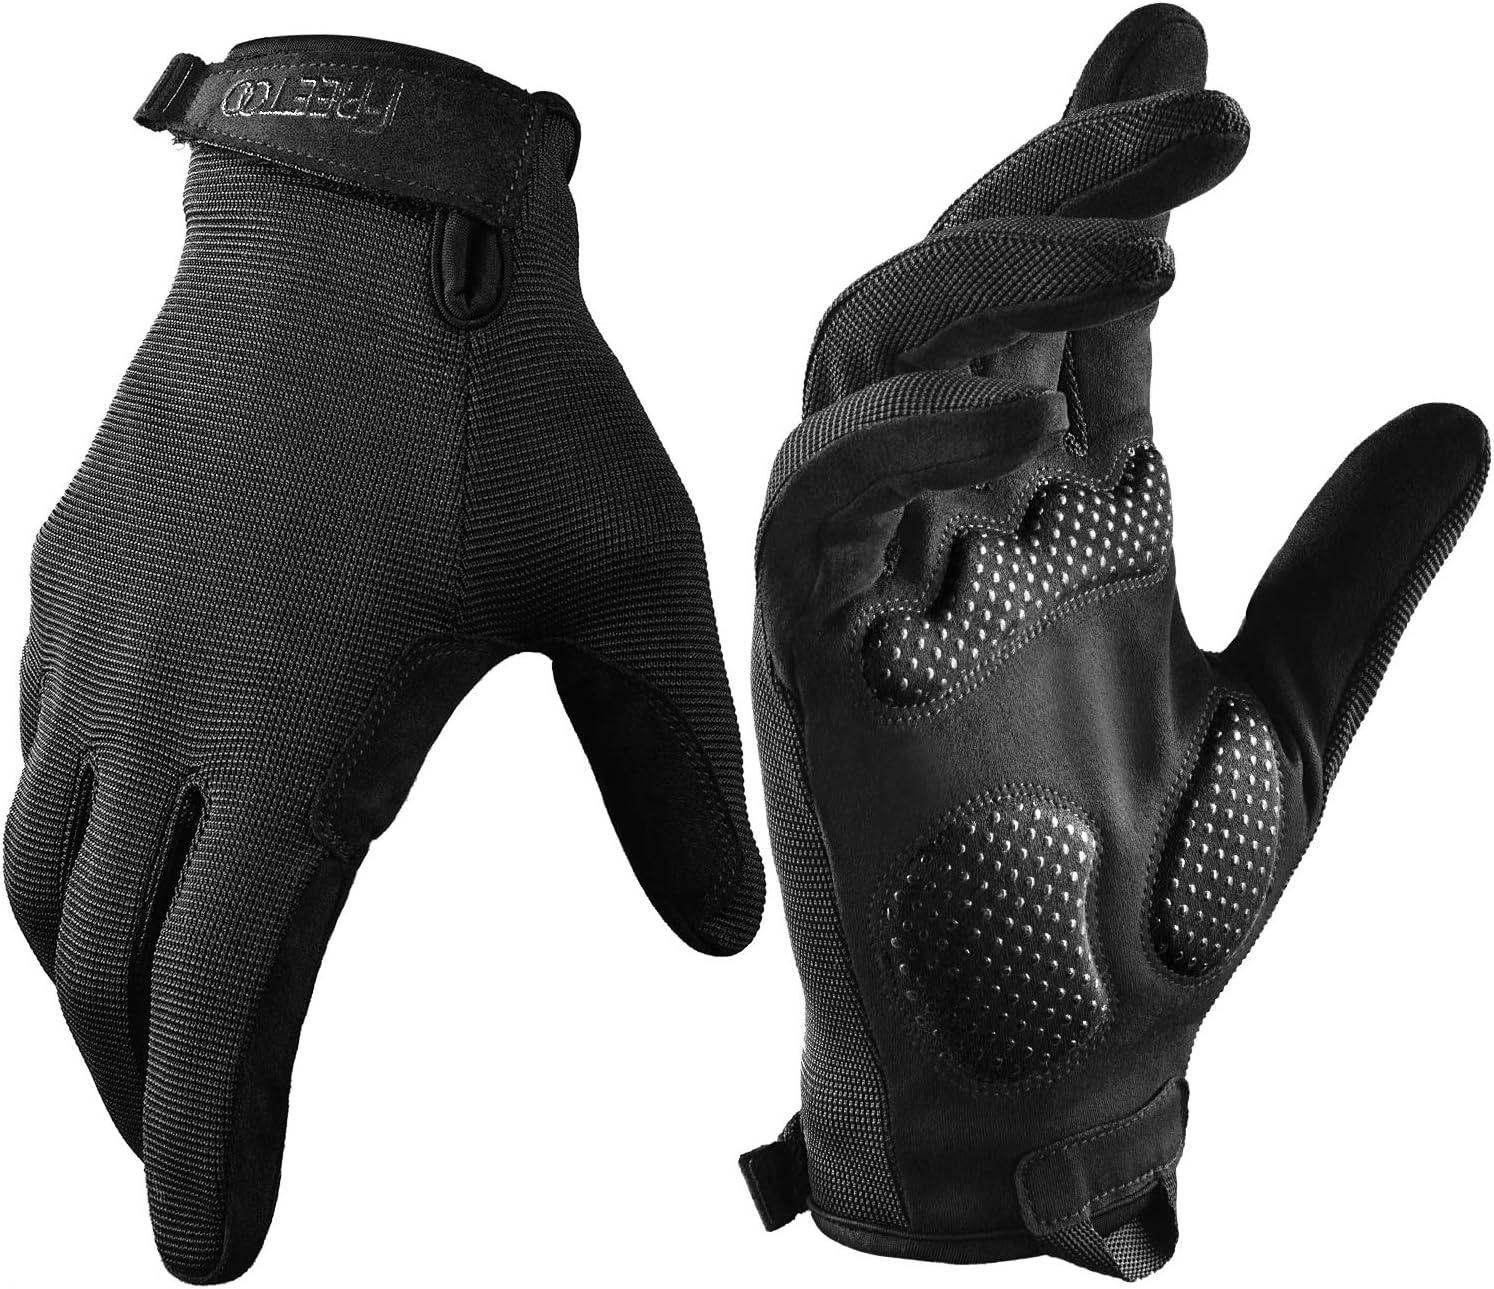 FREETOO Full Finger Workout 5 popular Gloves for Grip Extra Foam San Jose Mall Men P